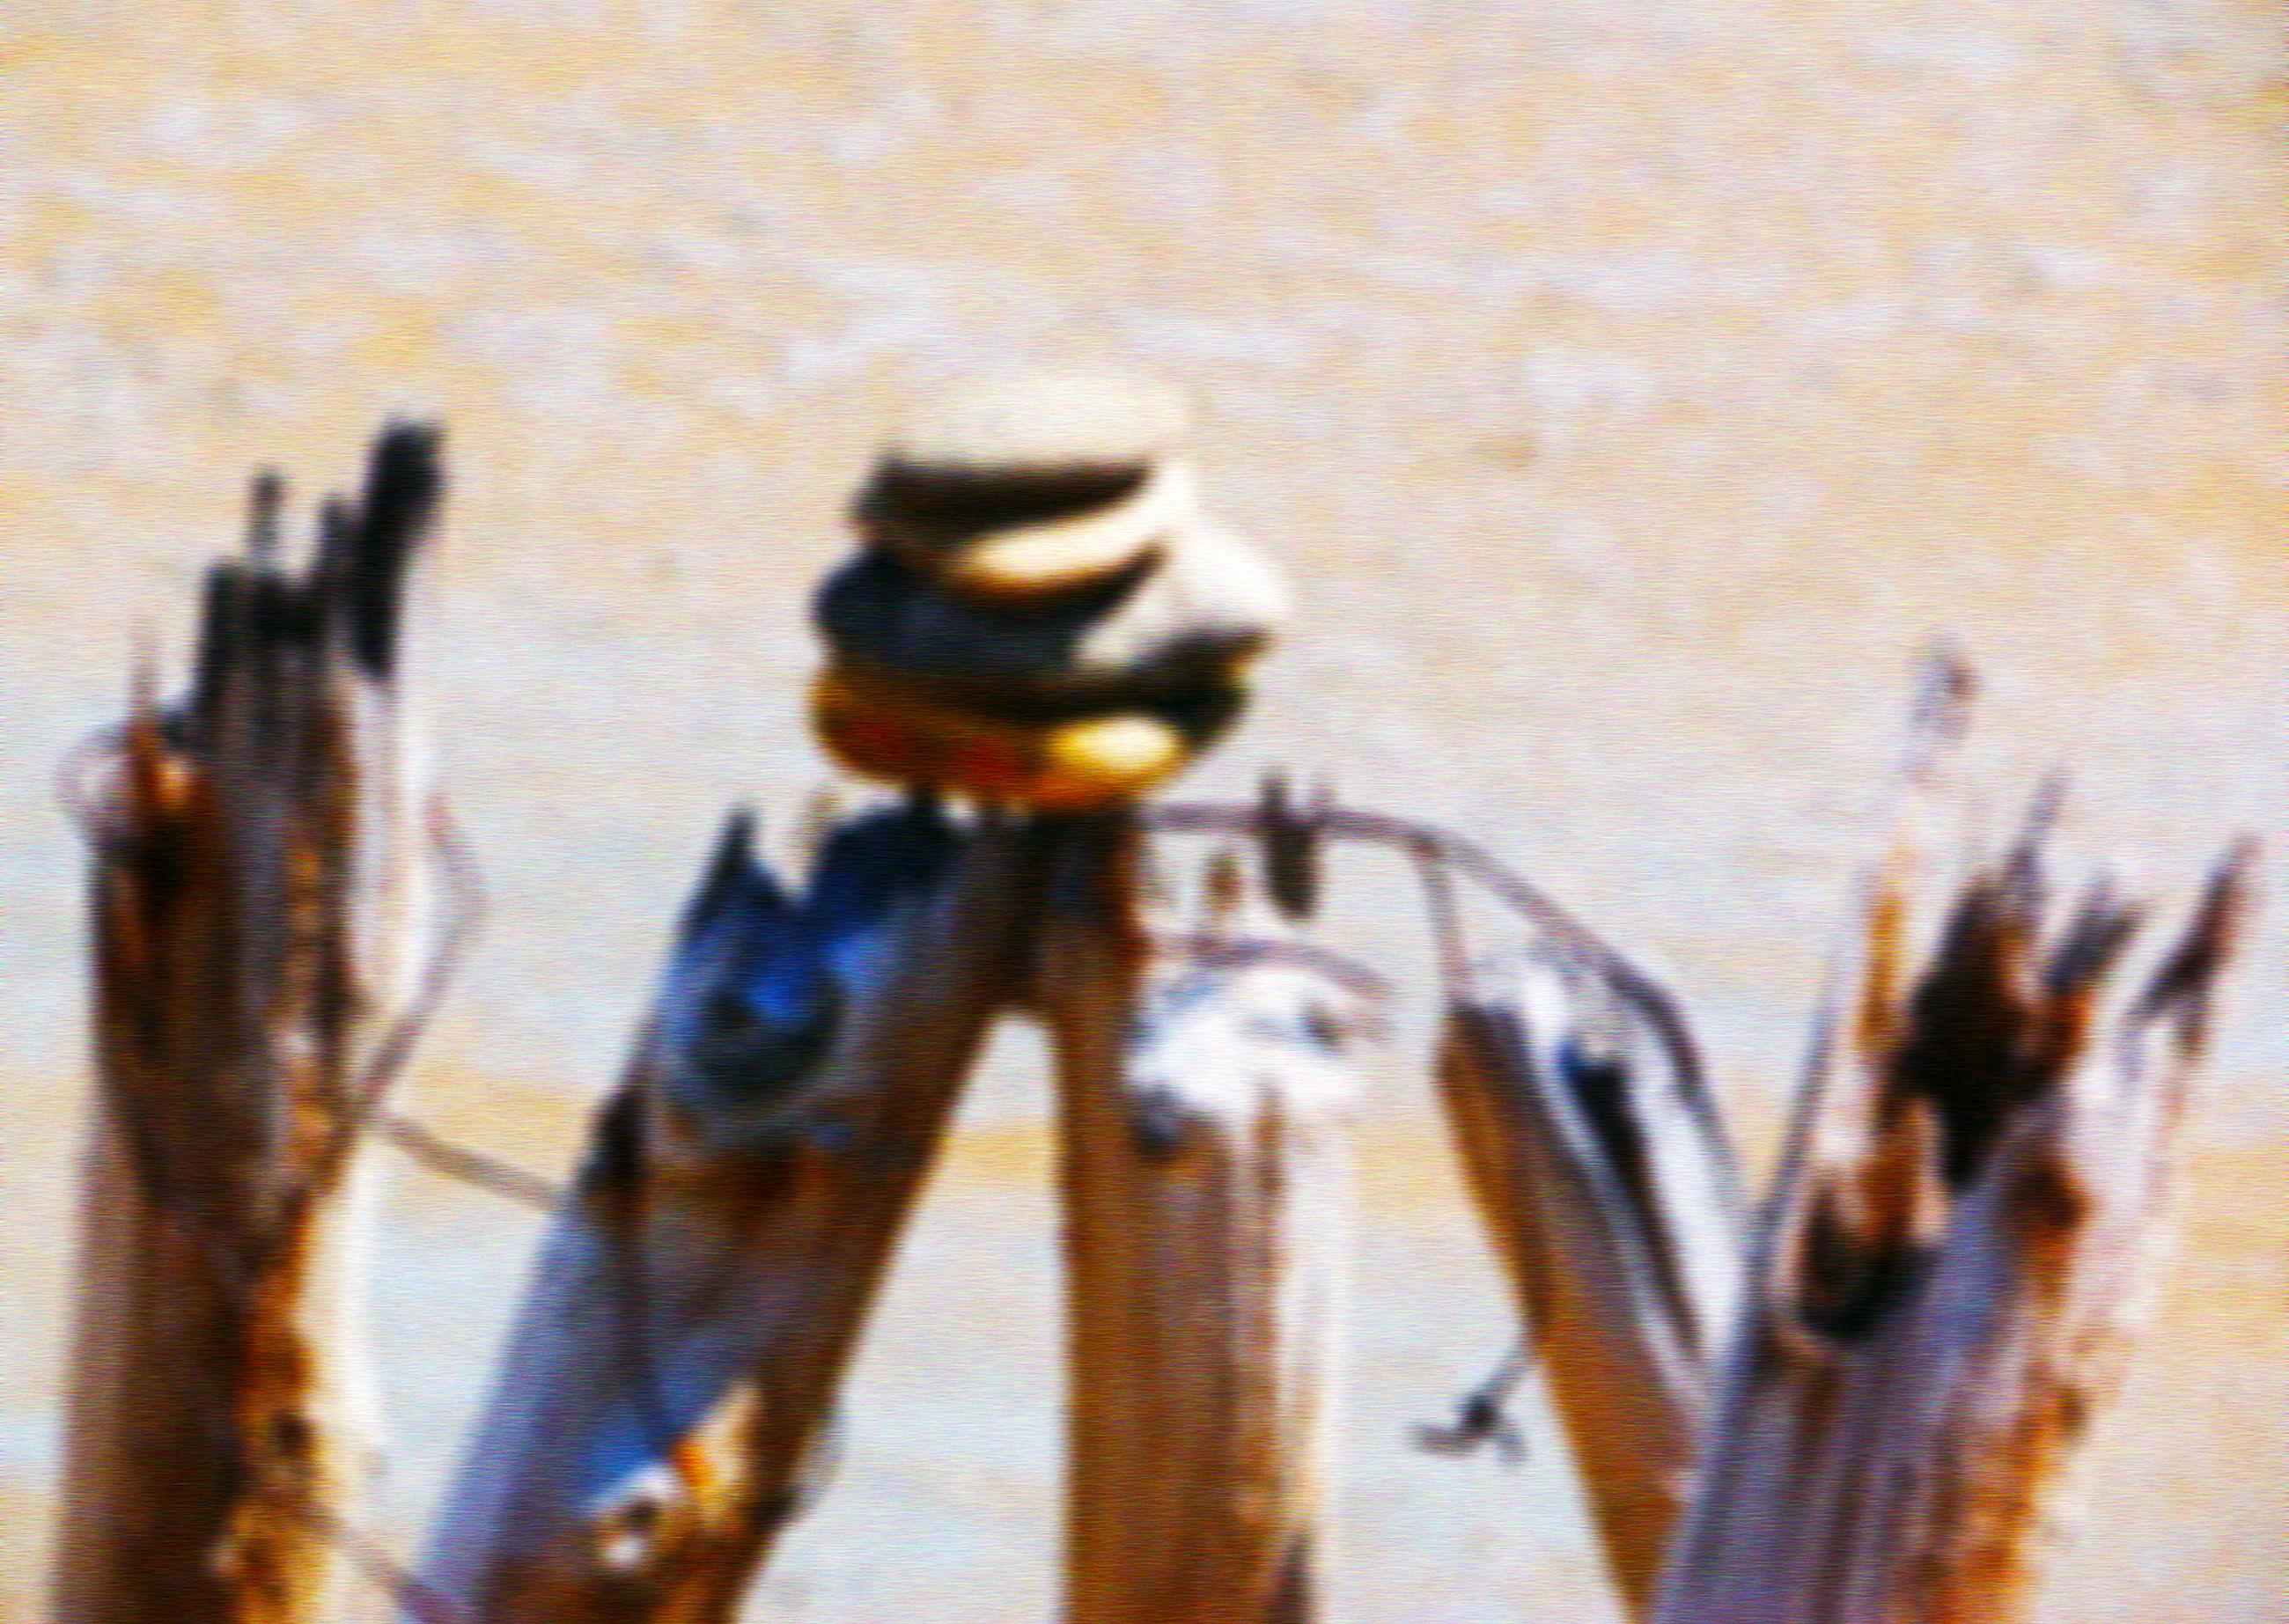 Defocused image of pebbles on wooden posts